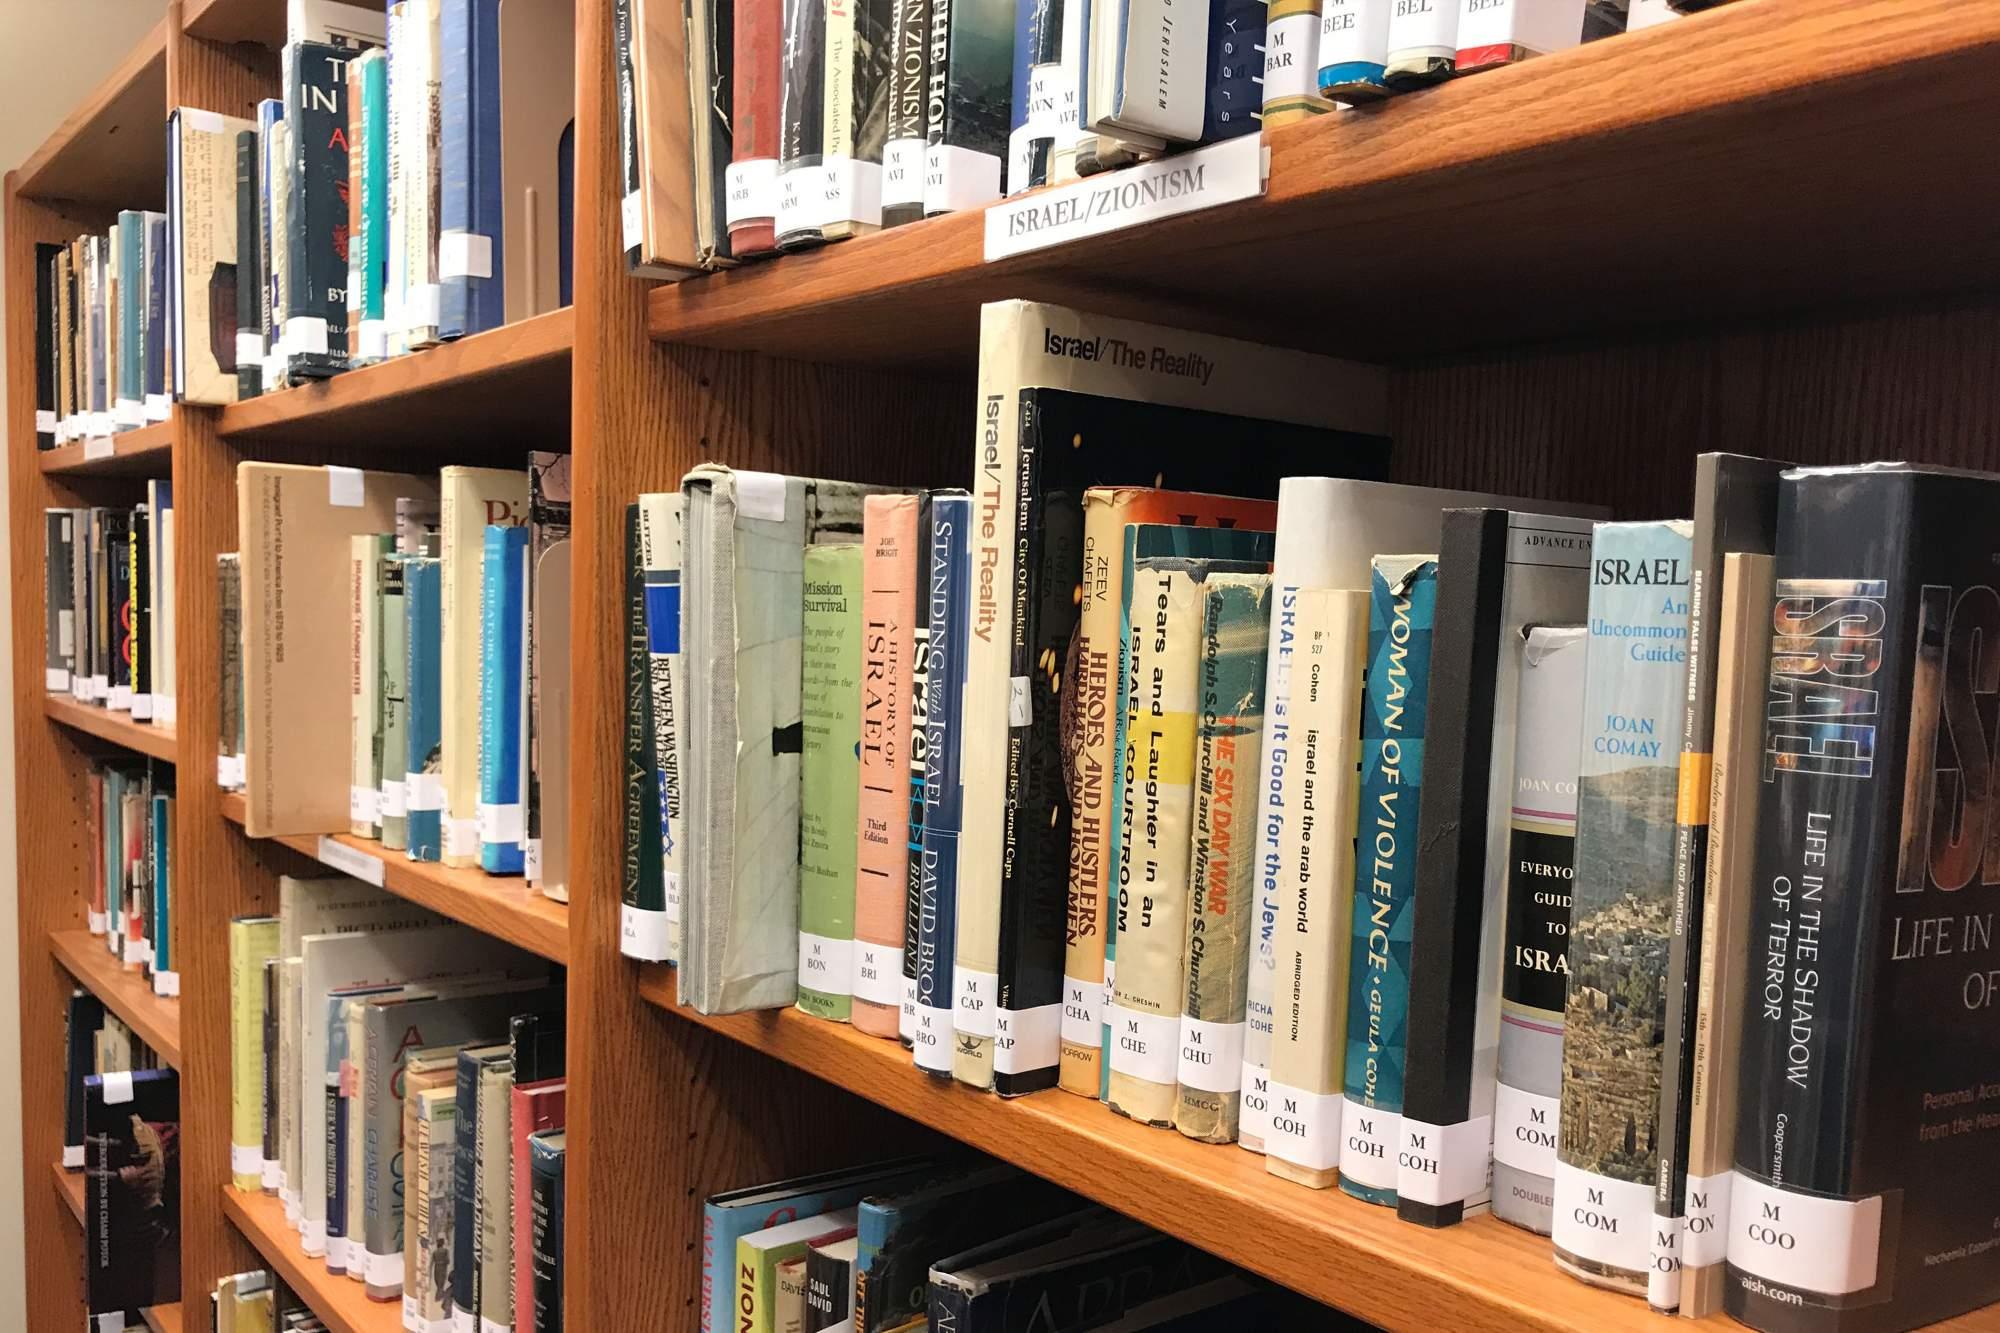 Hendel Library's 70th Anniversary